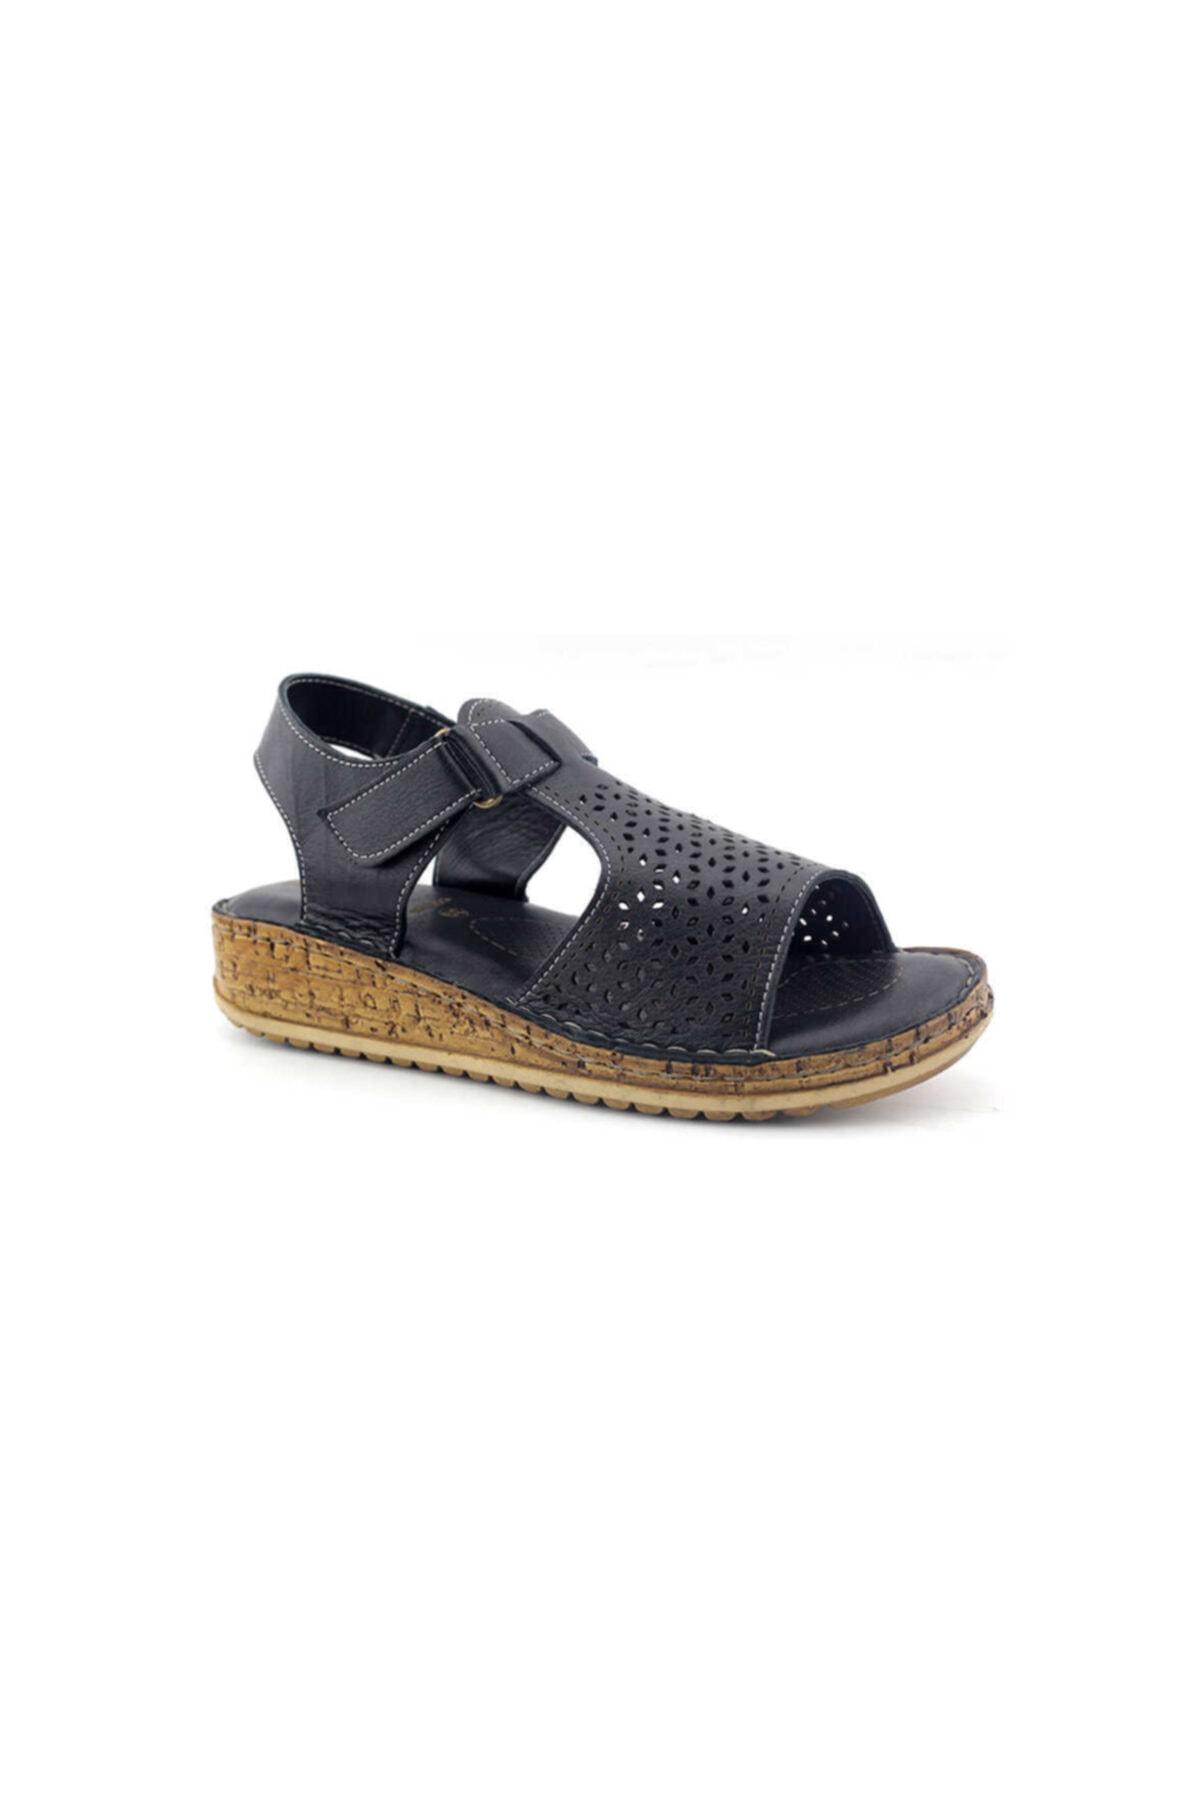 Kayra 910 Hakiki Deri Kadın Sandalet-siyah 2